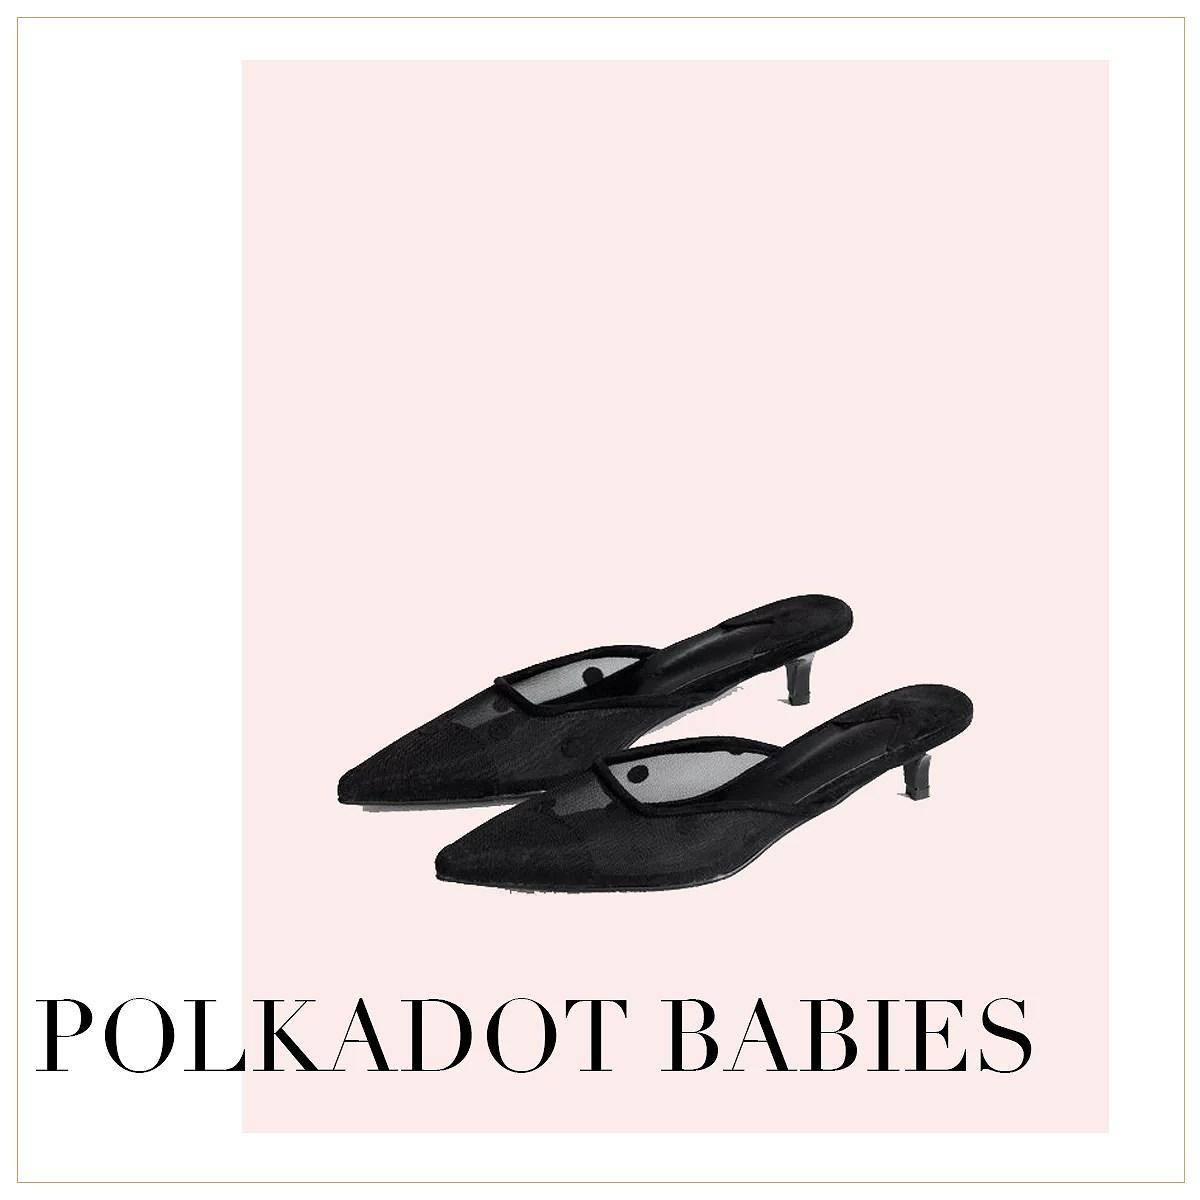 POLKADOT BABIES